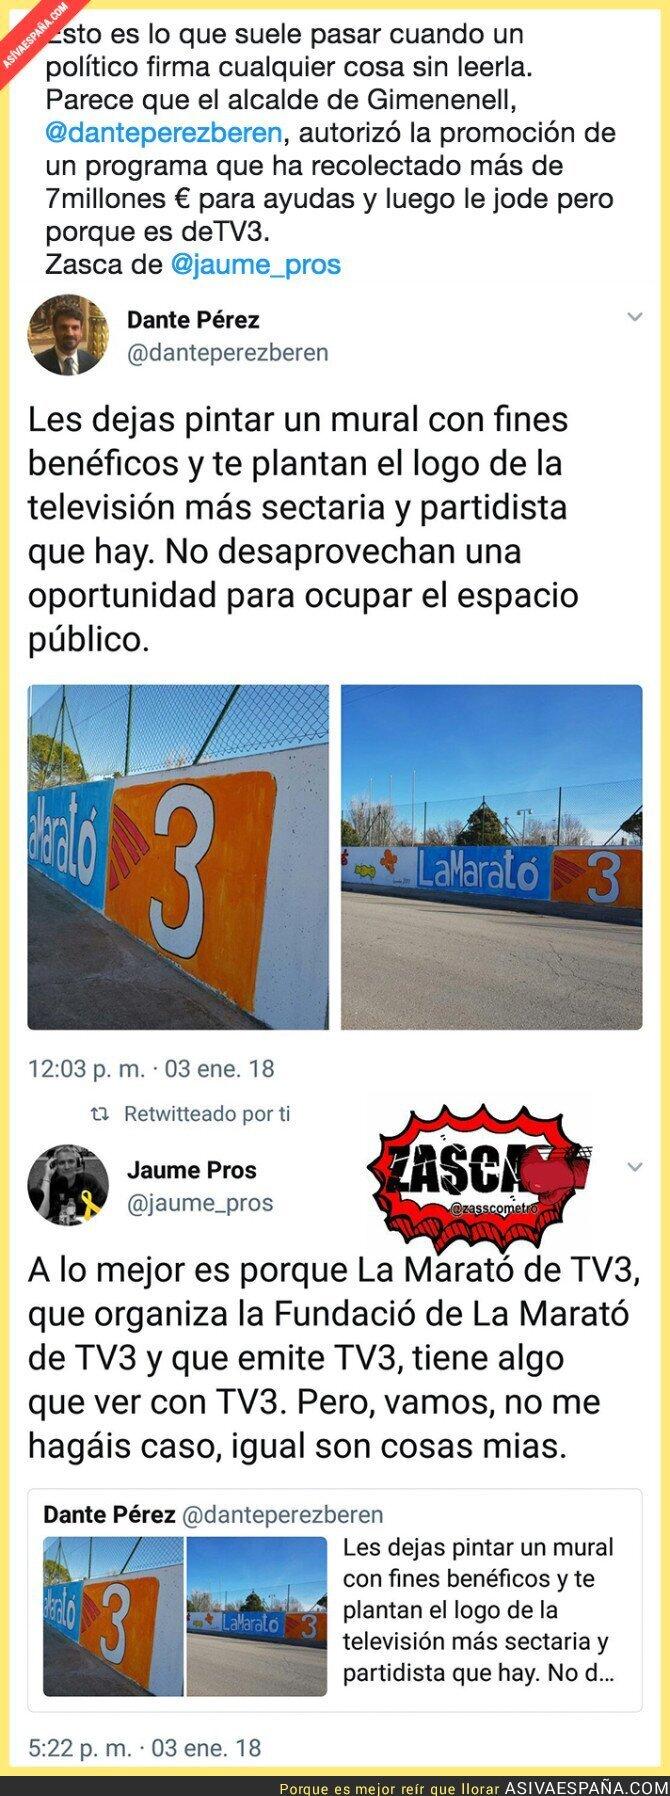 81004 - La Marató de TV3 no se toca o saldrás caliente